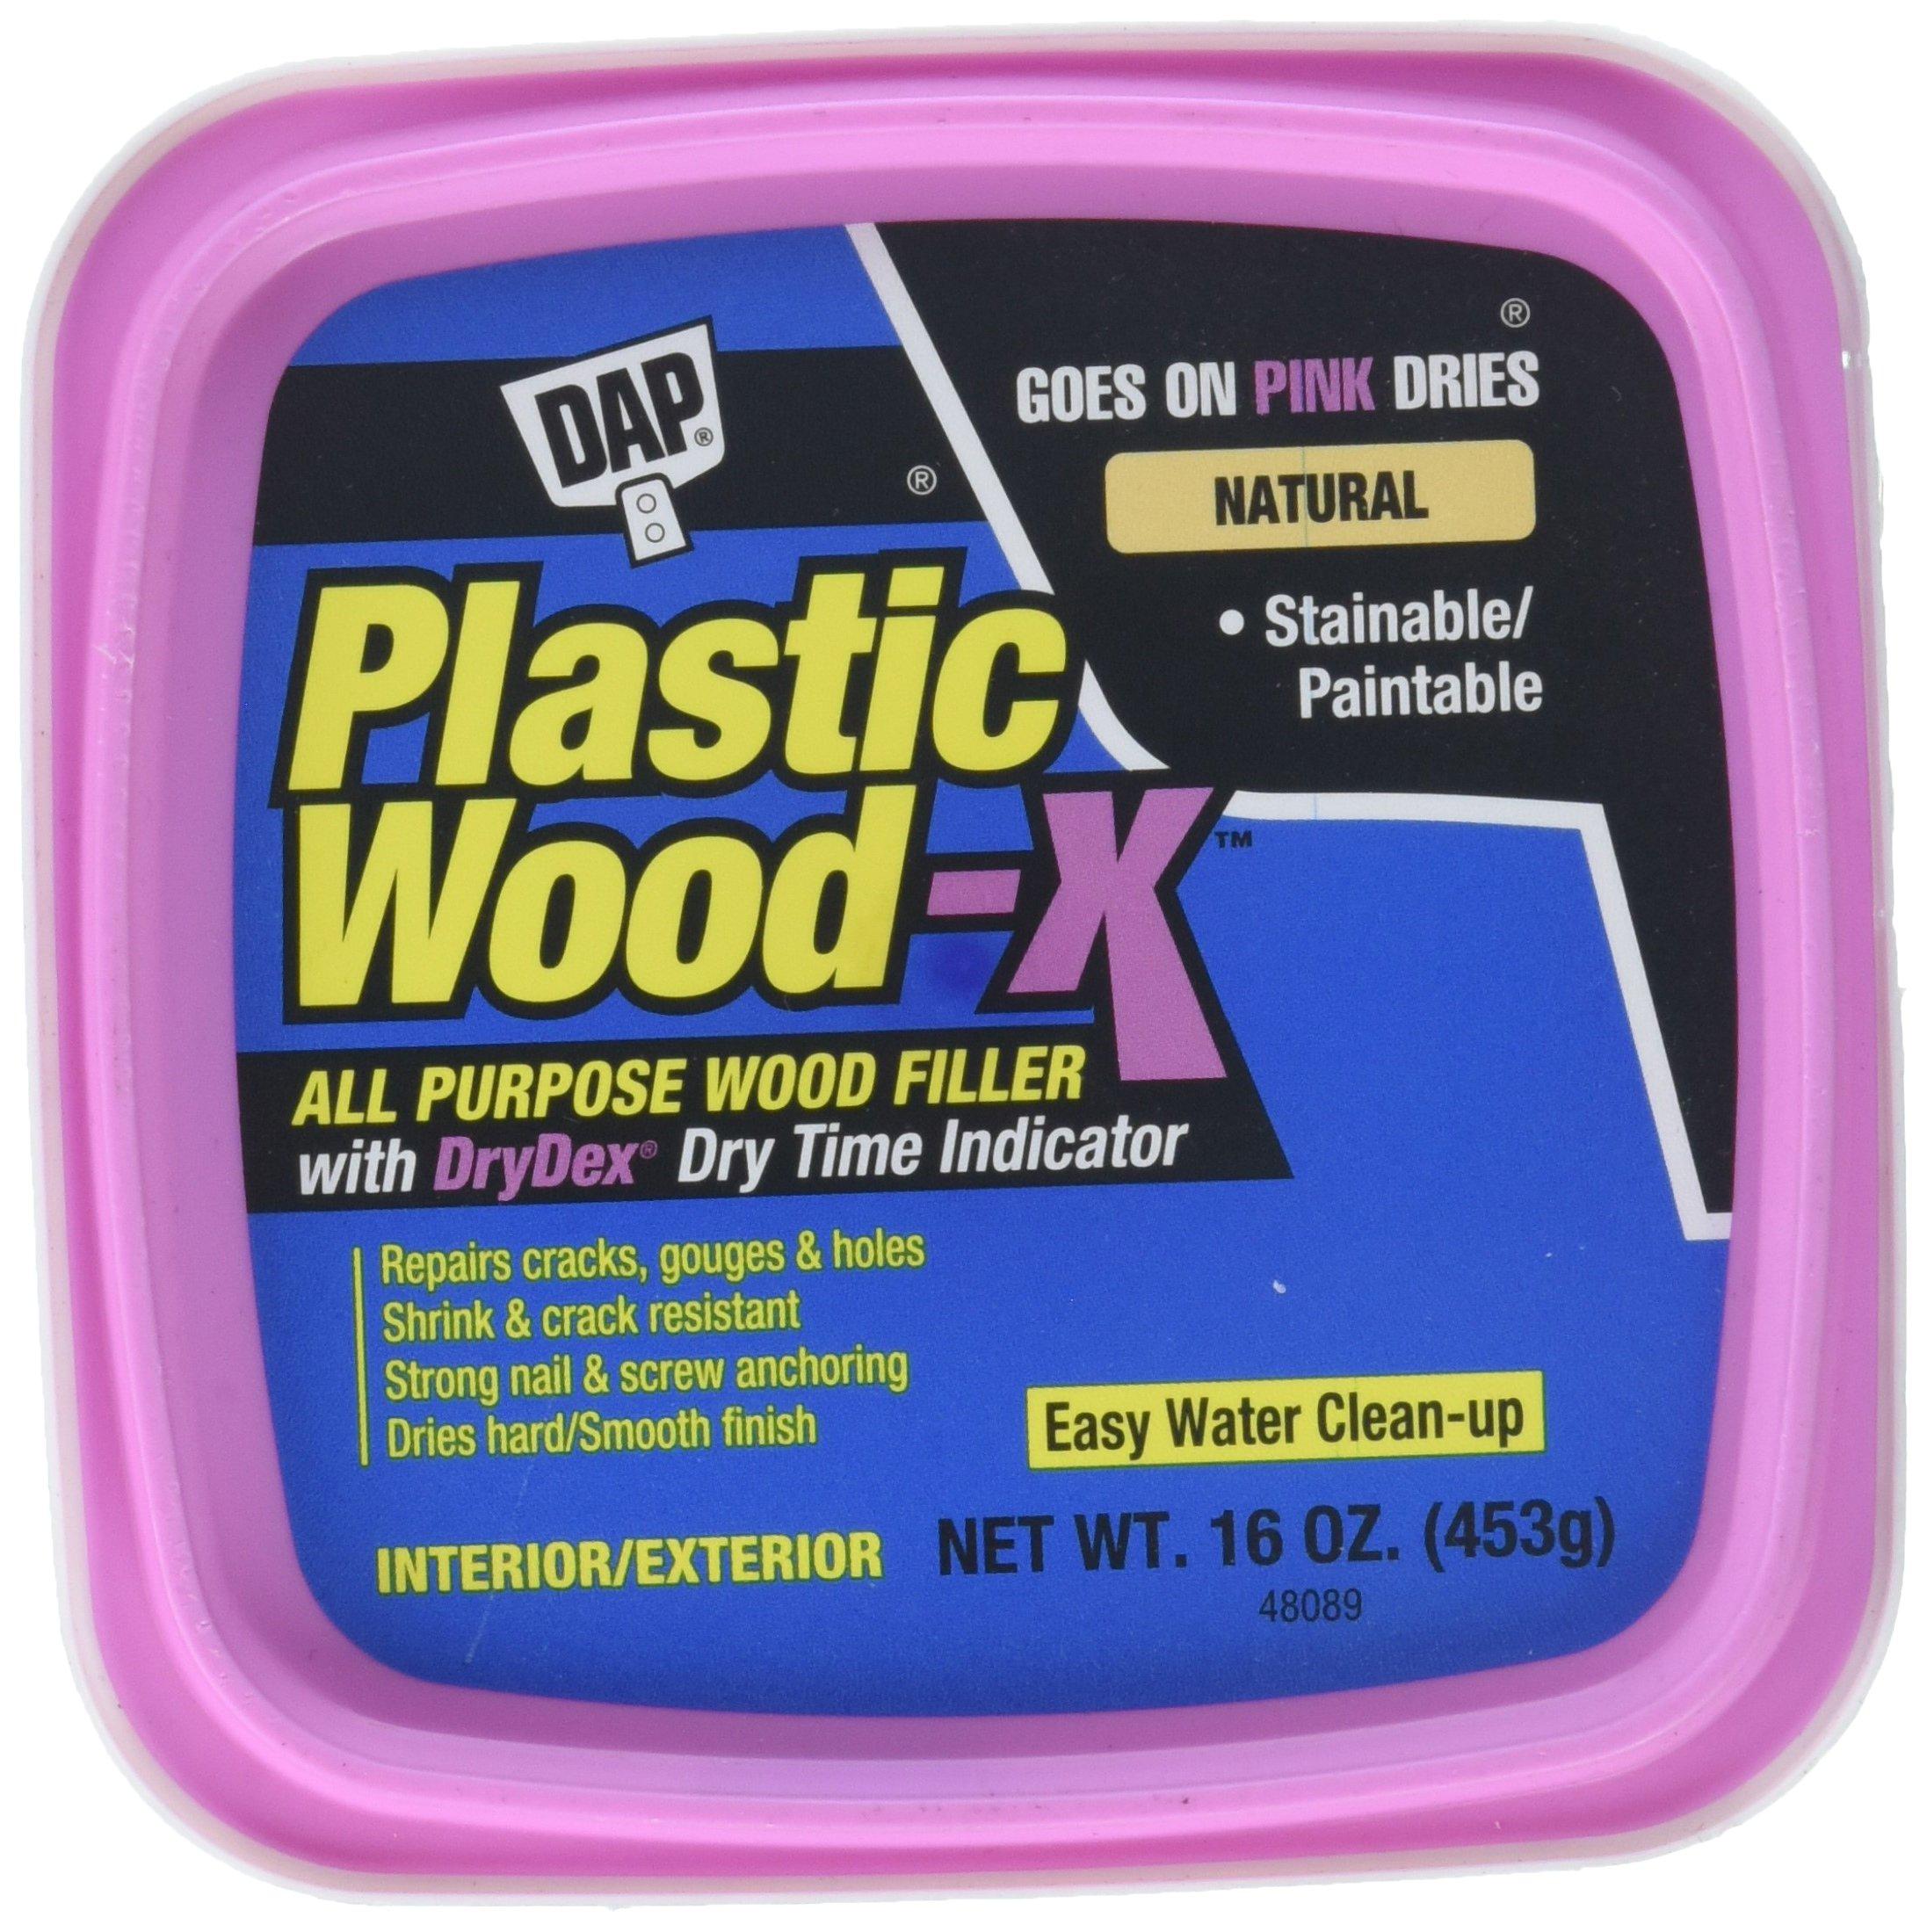 DAP 542 PT Natural Plastic Wood-X with DryDex